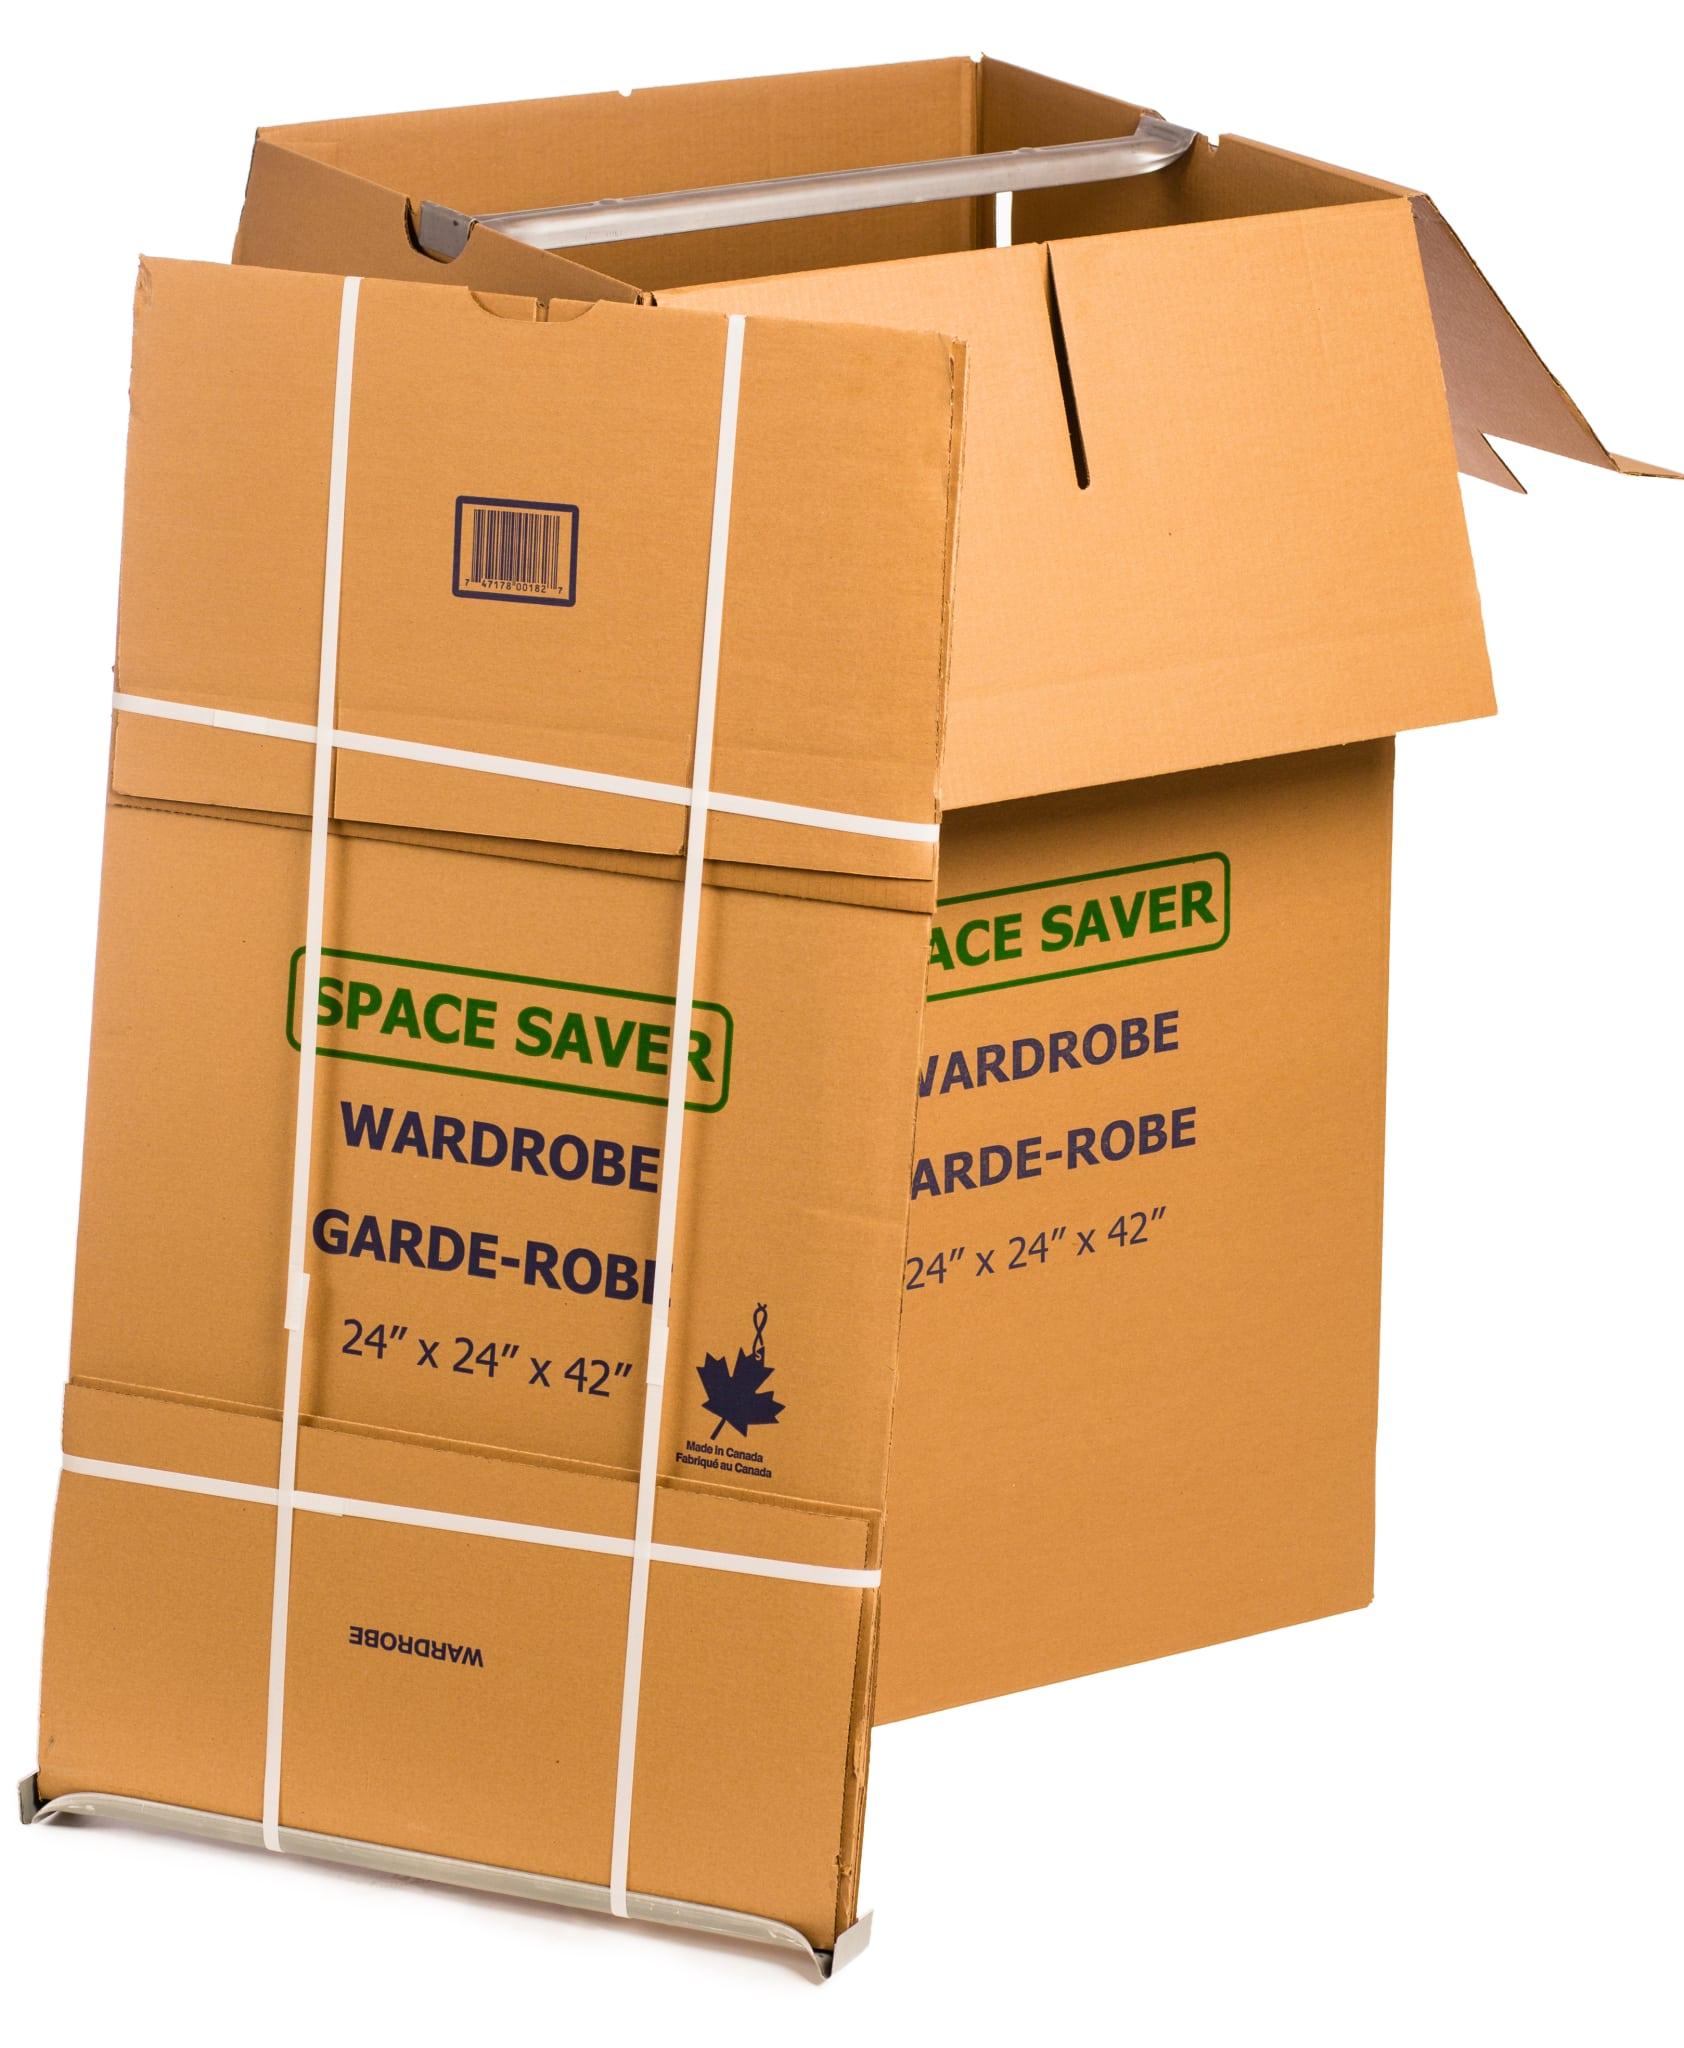 services moving small product bar boxes wardrobe box